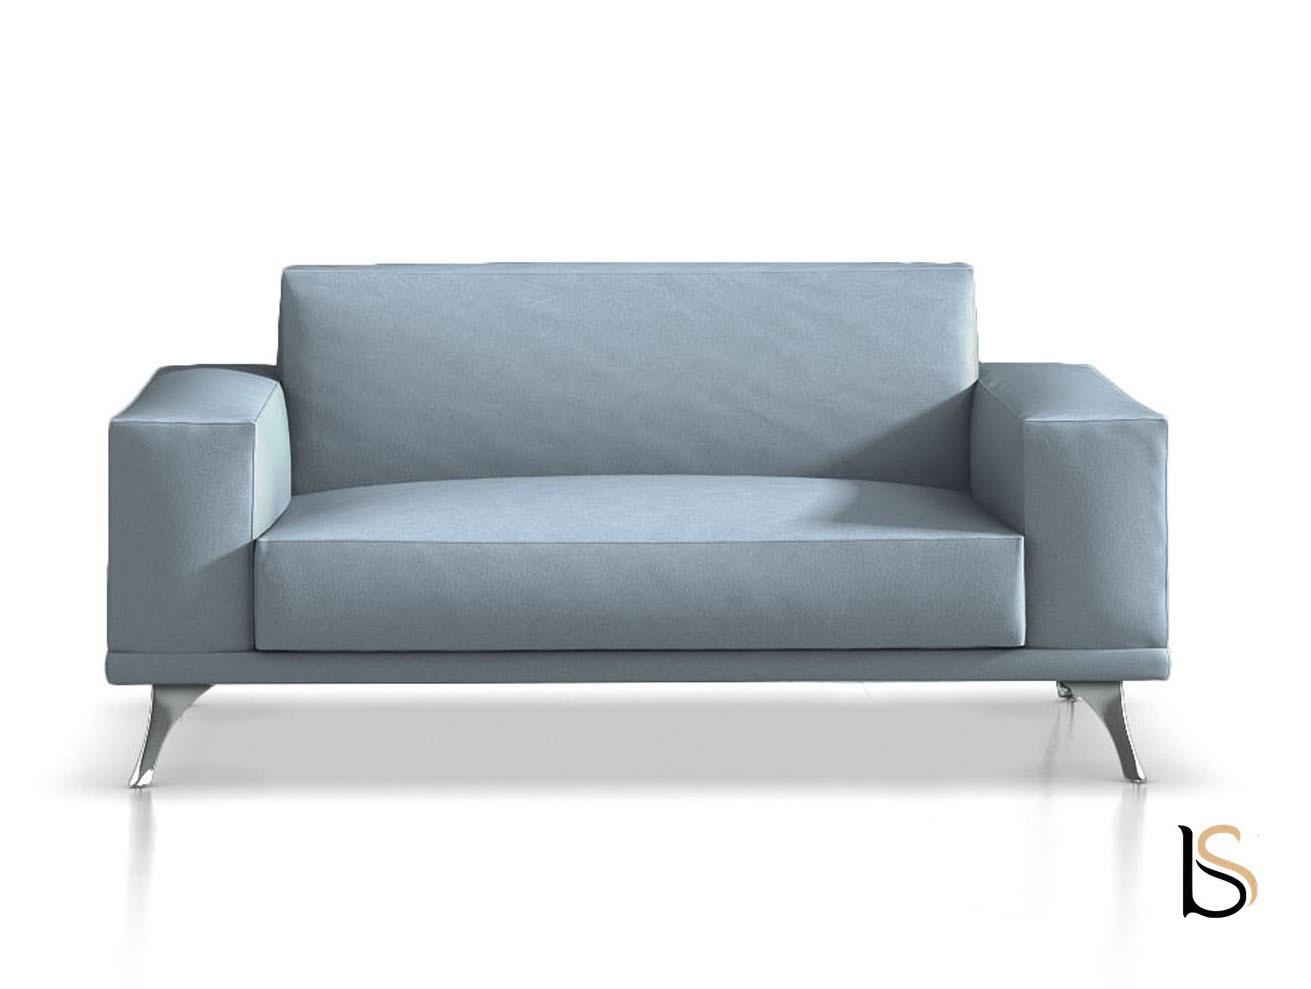 canap d accueil 2 places sf mobel linea canap s d 39 accueil mobel. Black Bedroom Furniture Sets. Home Design Ideas